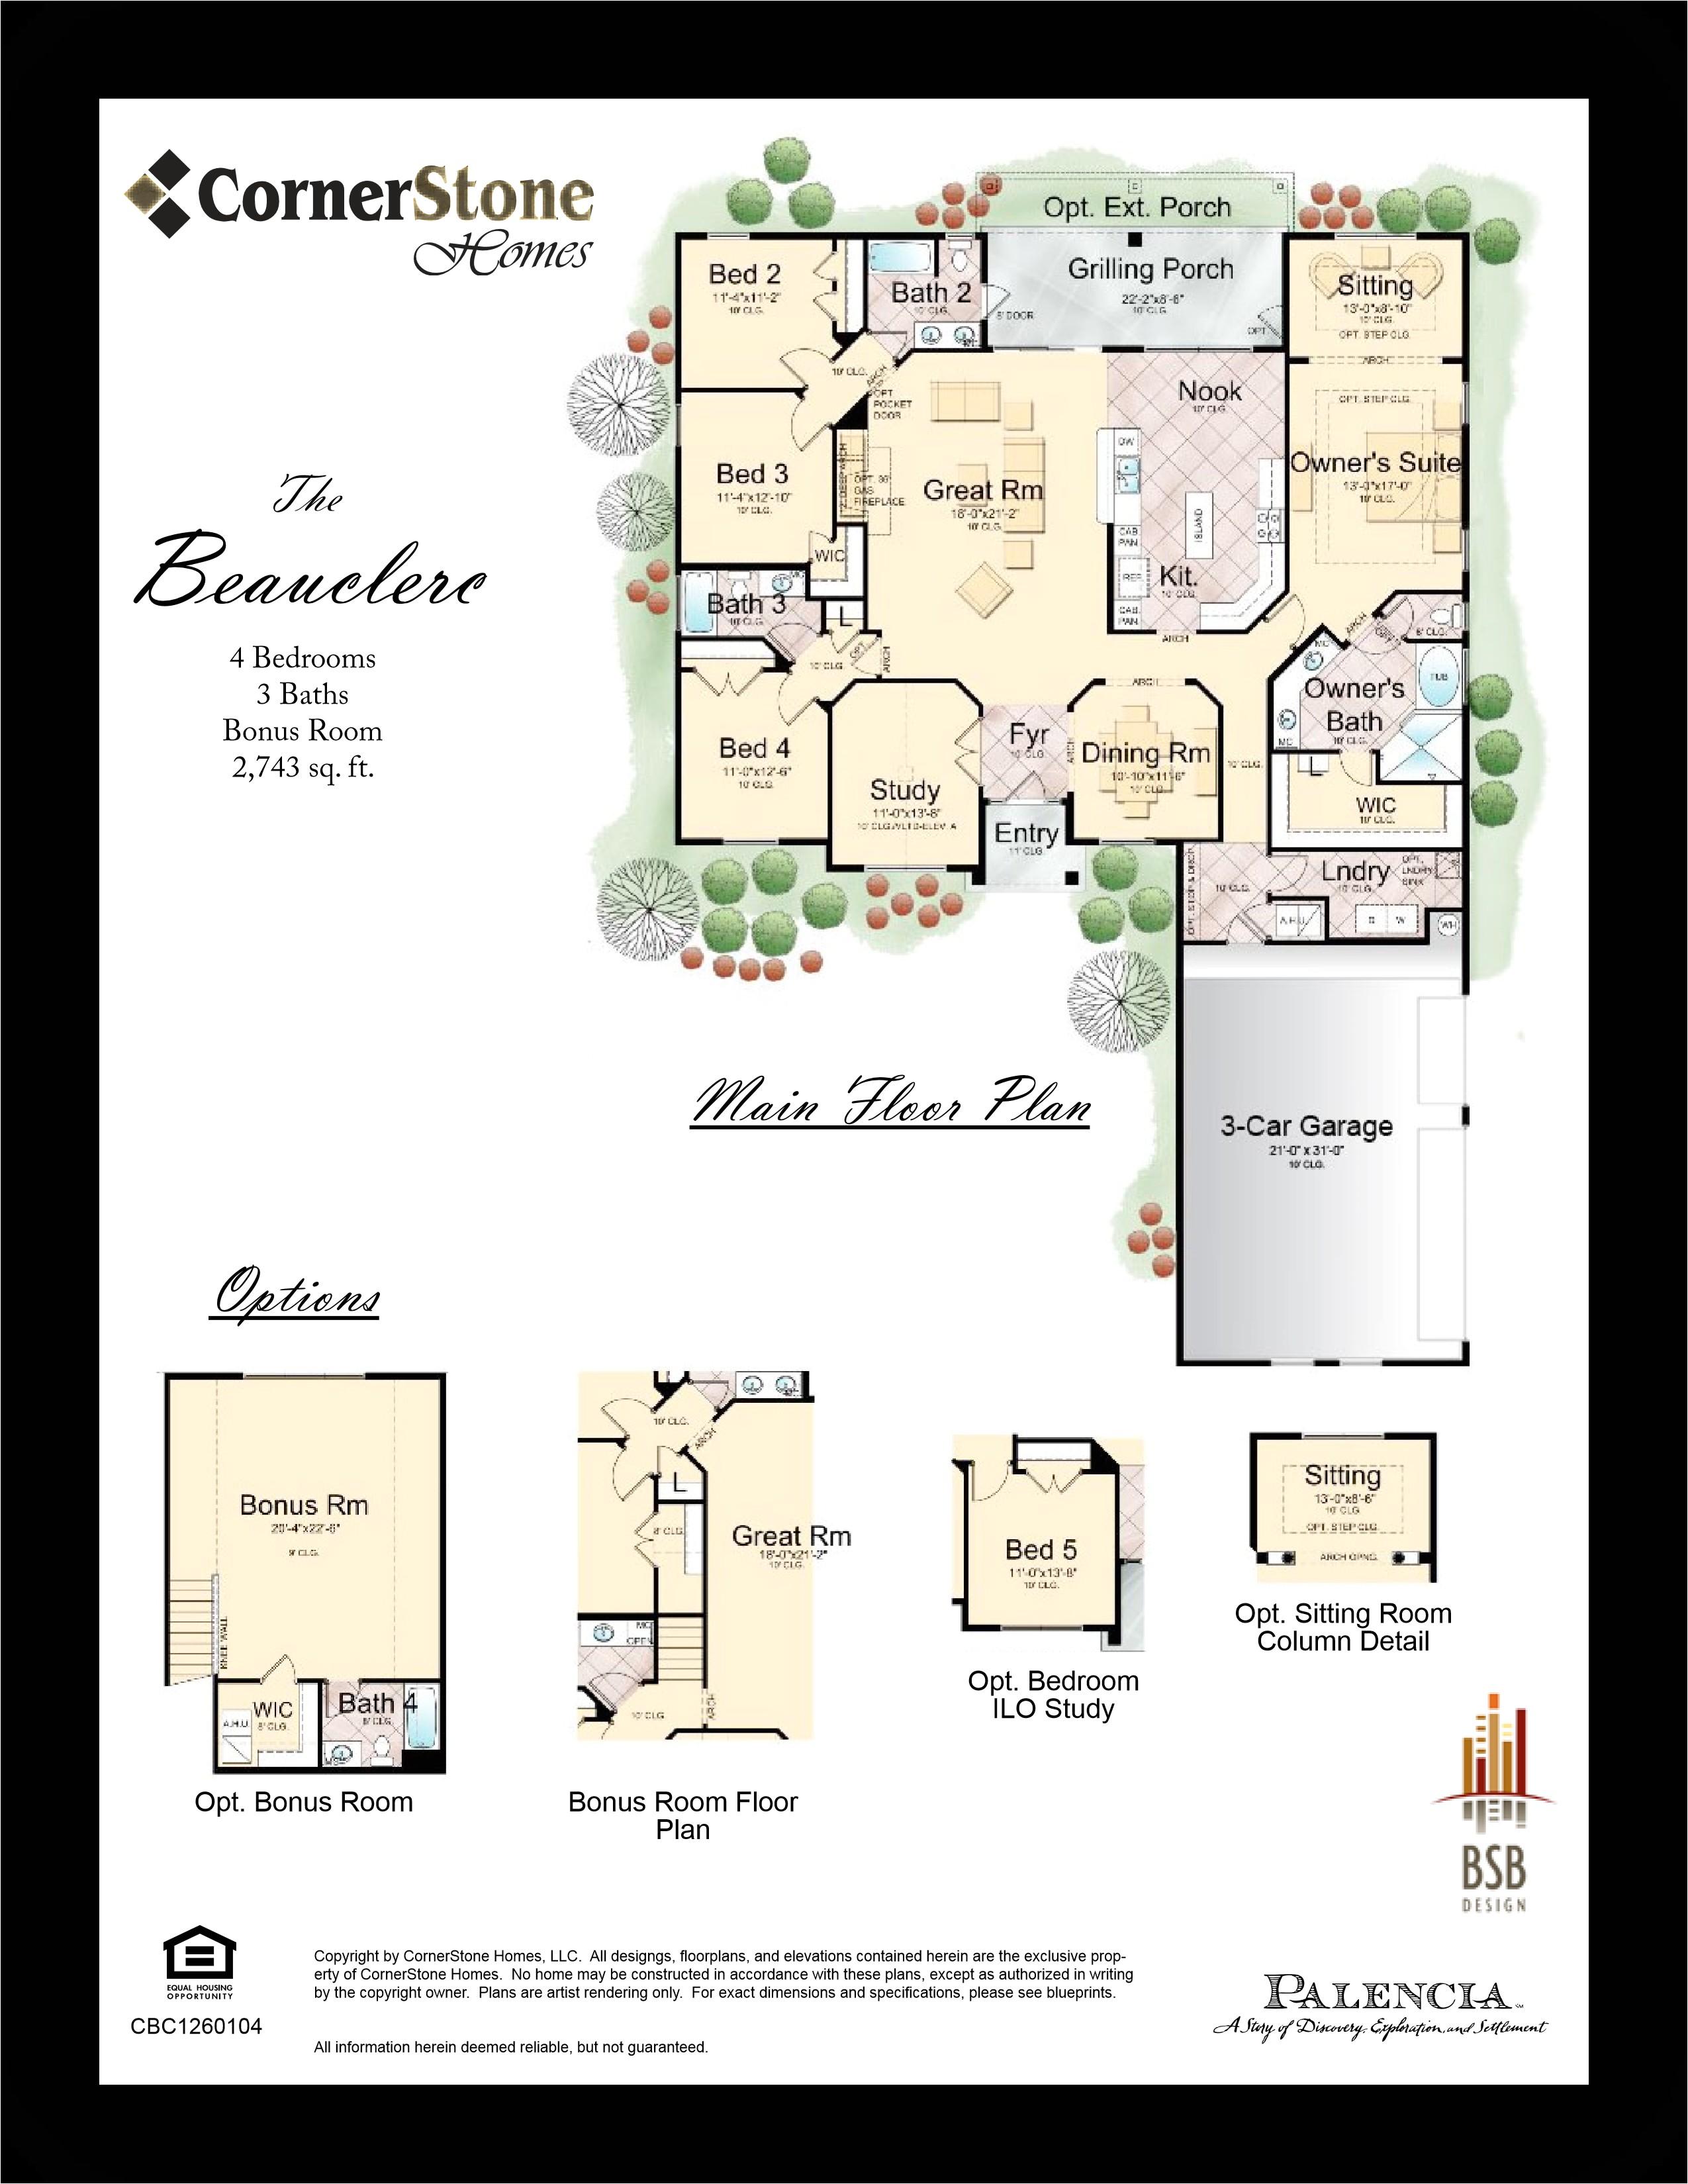 cornerstone homes floor plans